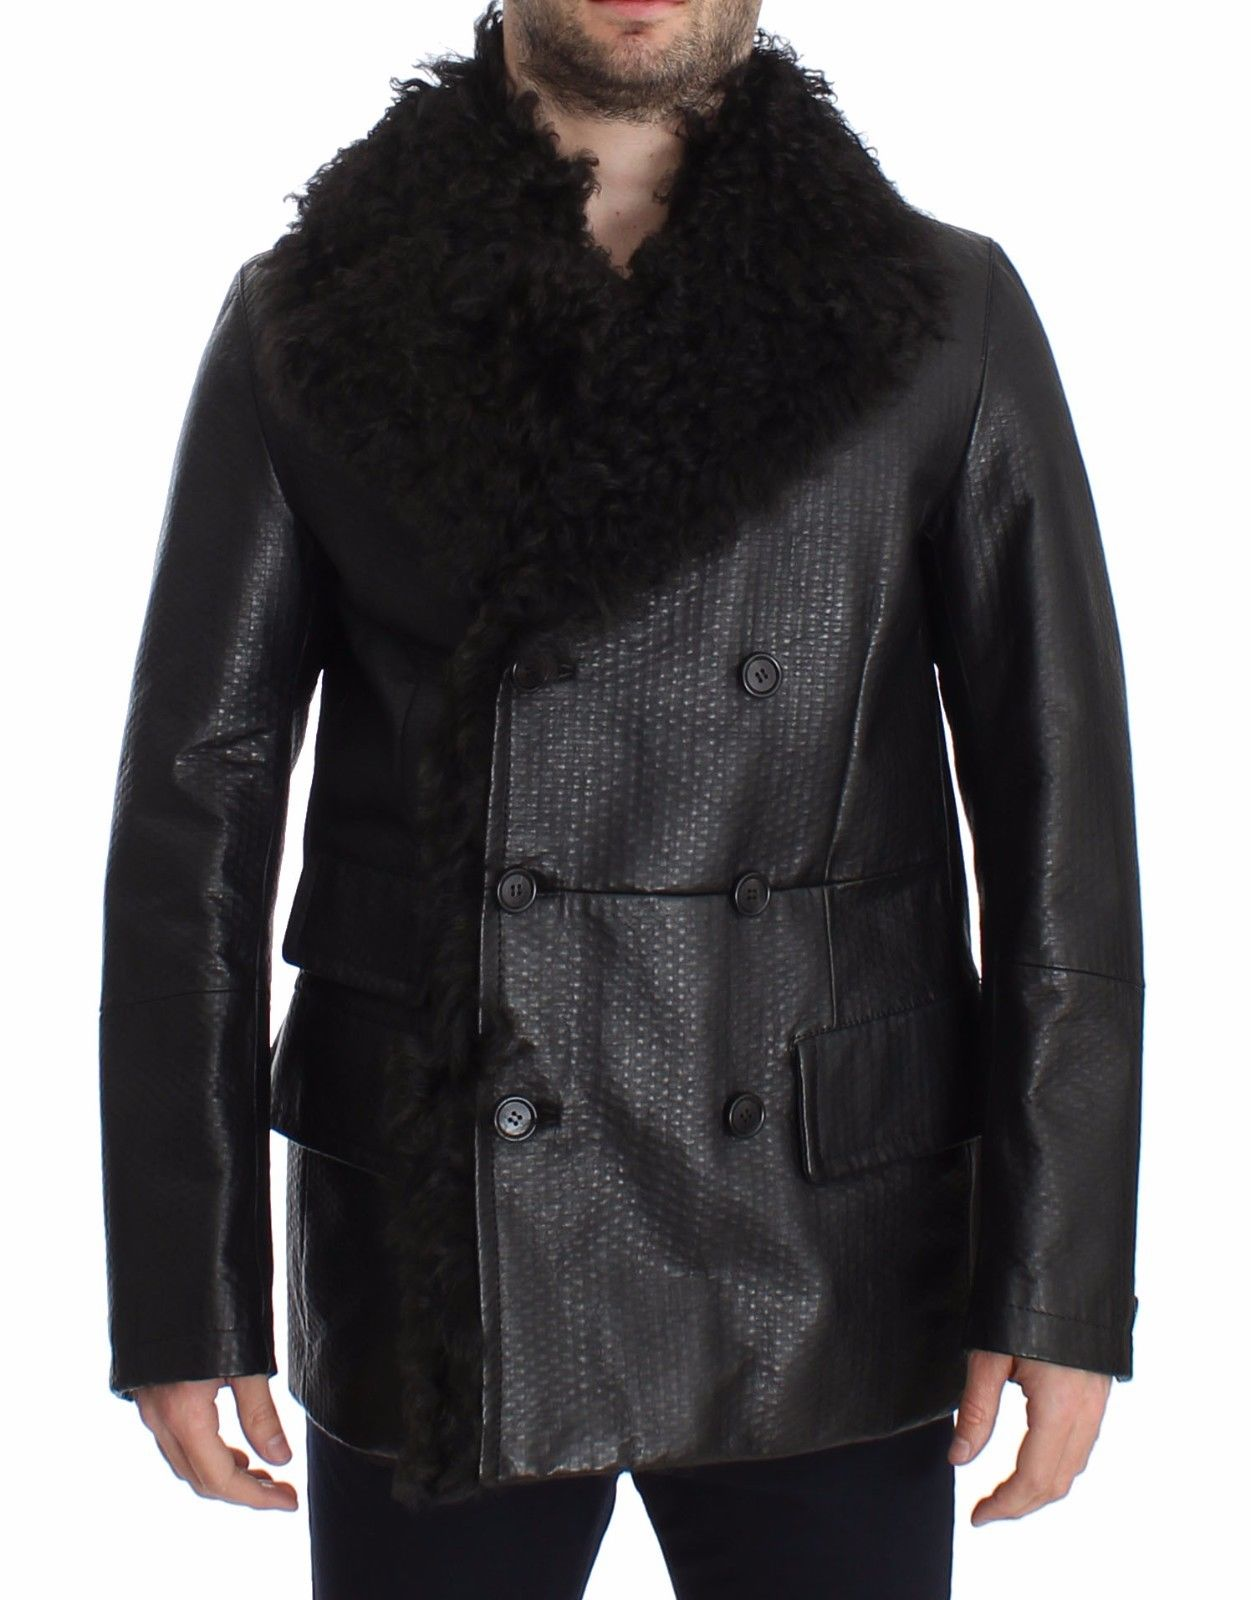 Dolce & Gabbana Men's Lambskin Leather Trenchcoat Black SIG14063 - IT46 | S